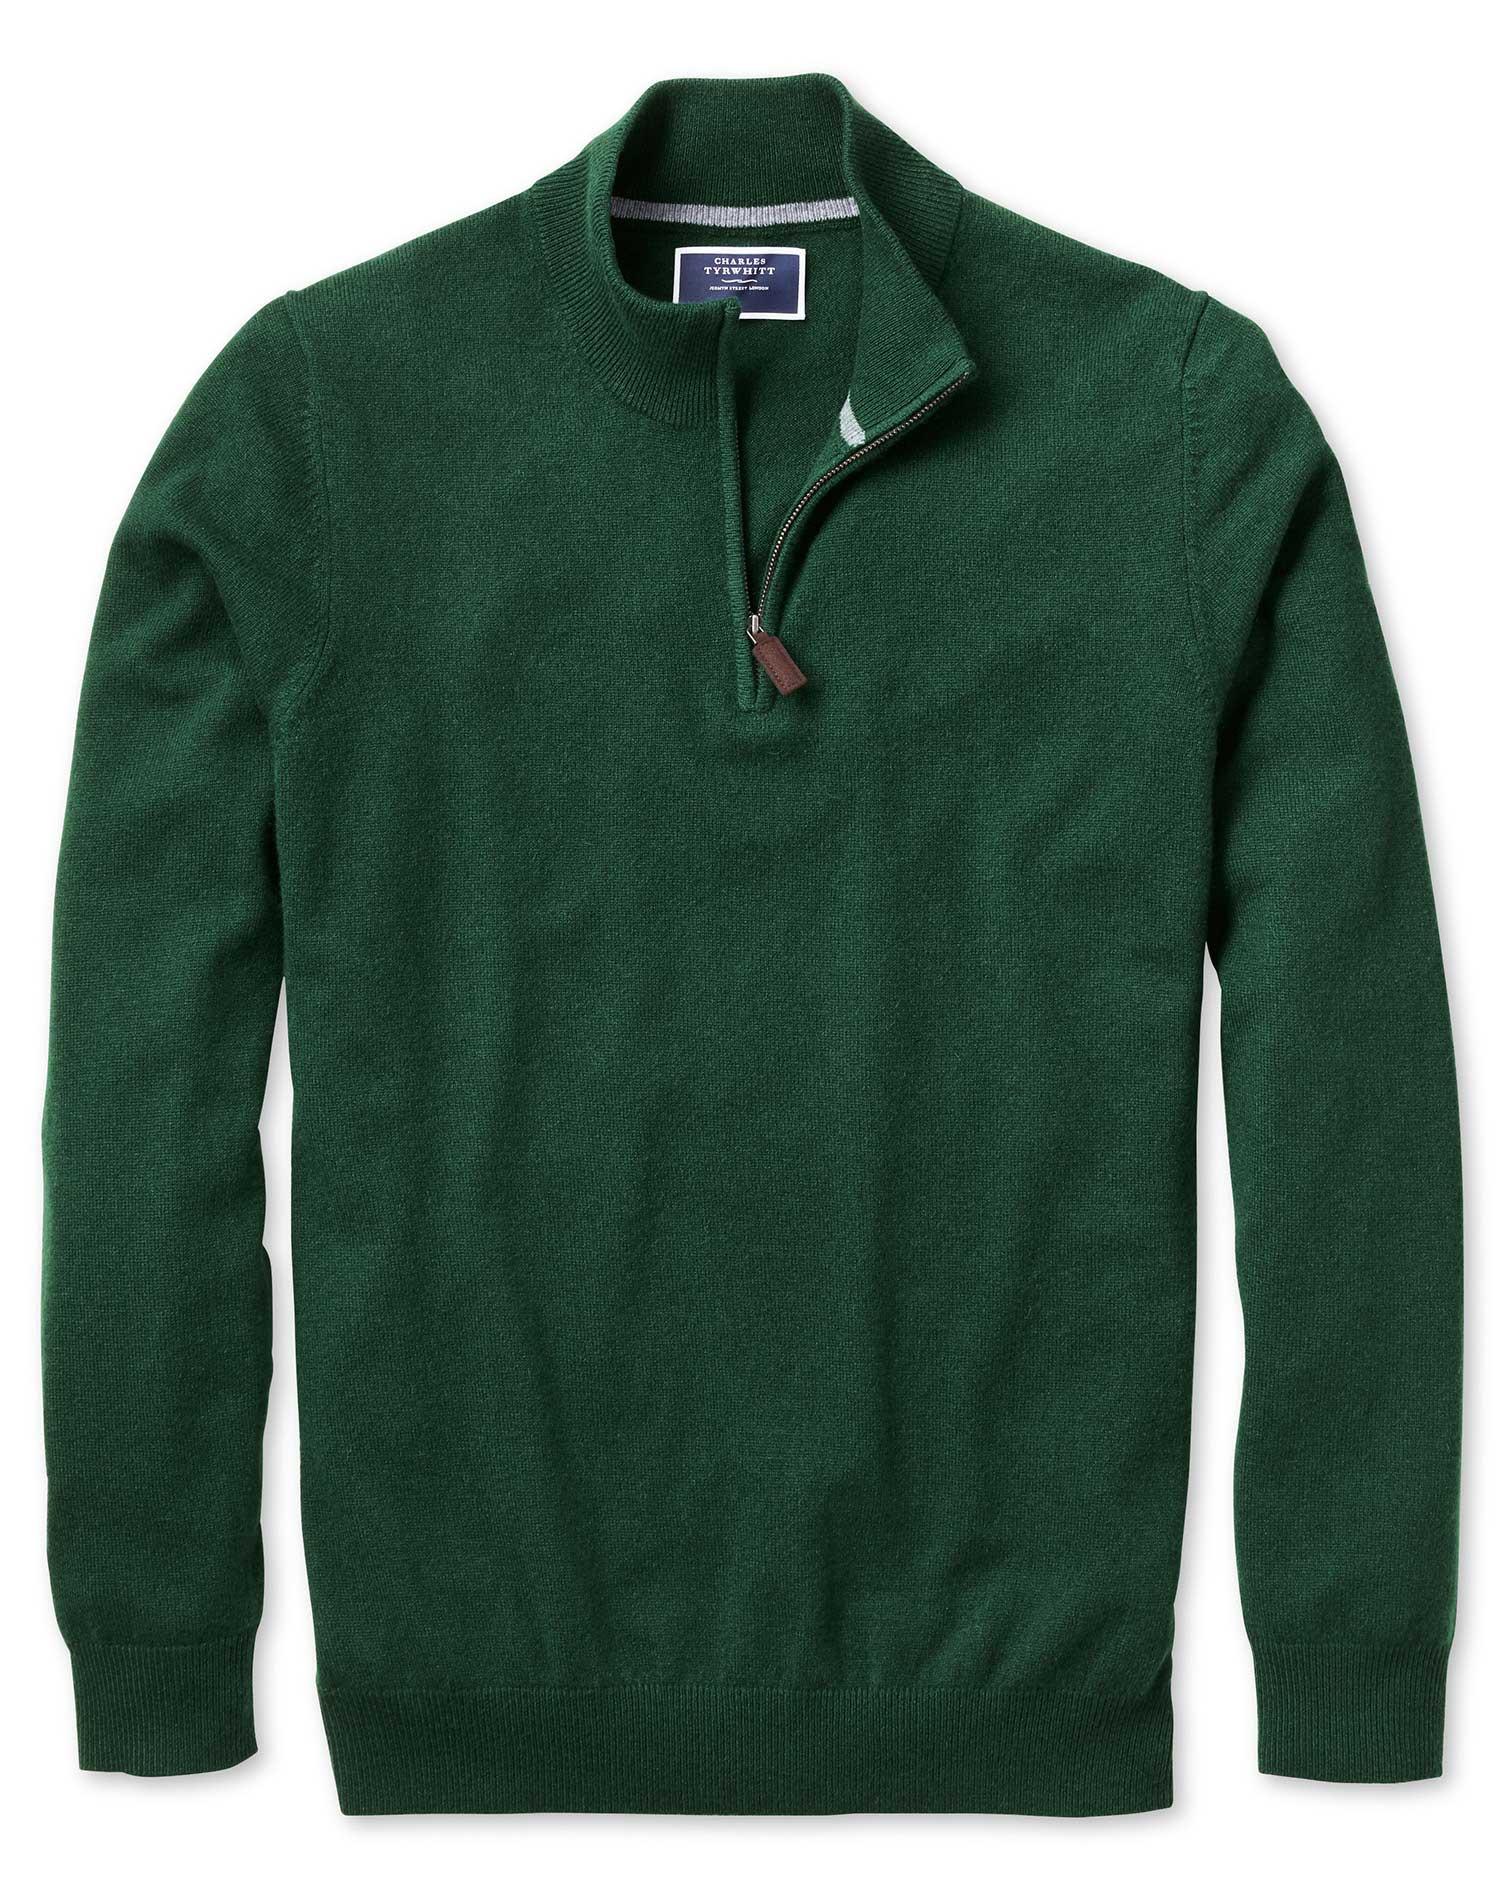 Green Zip Neck Cashmere Jumper Size XXL by Charles Tyrwhitt